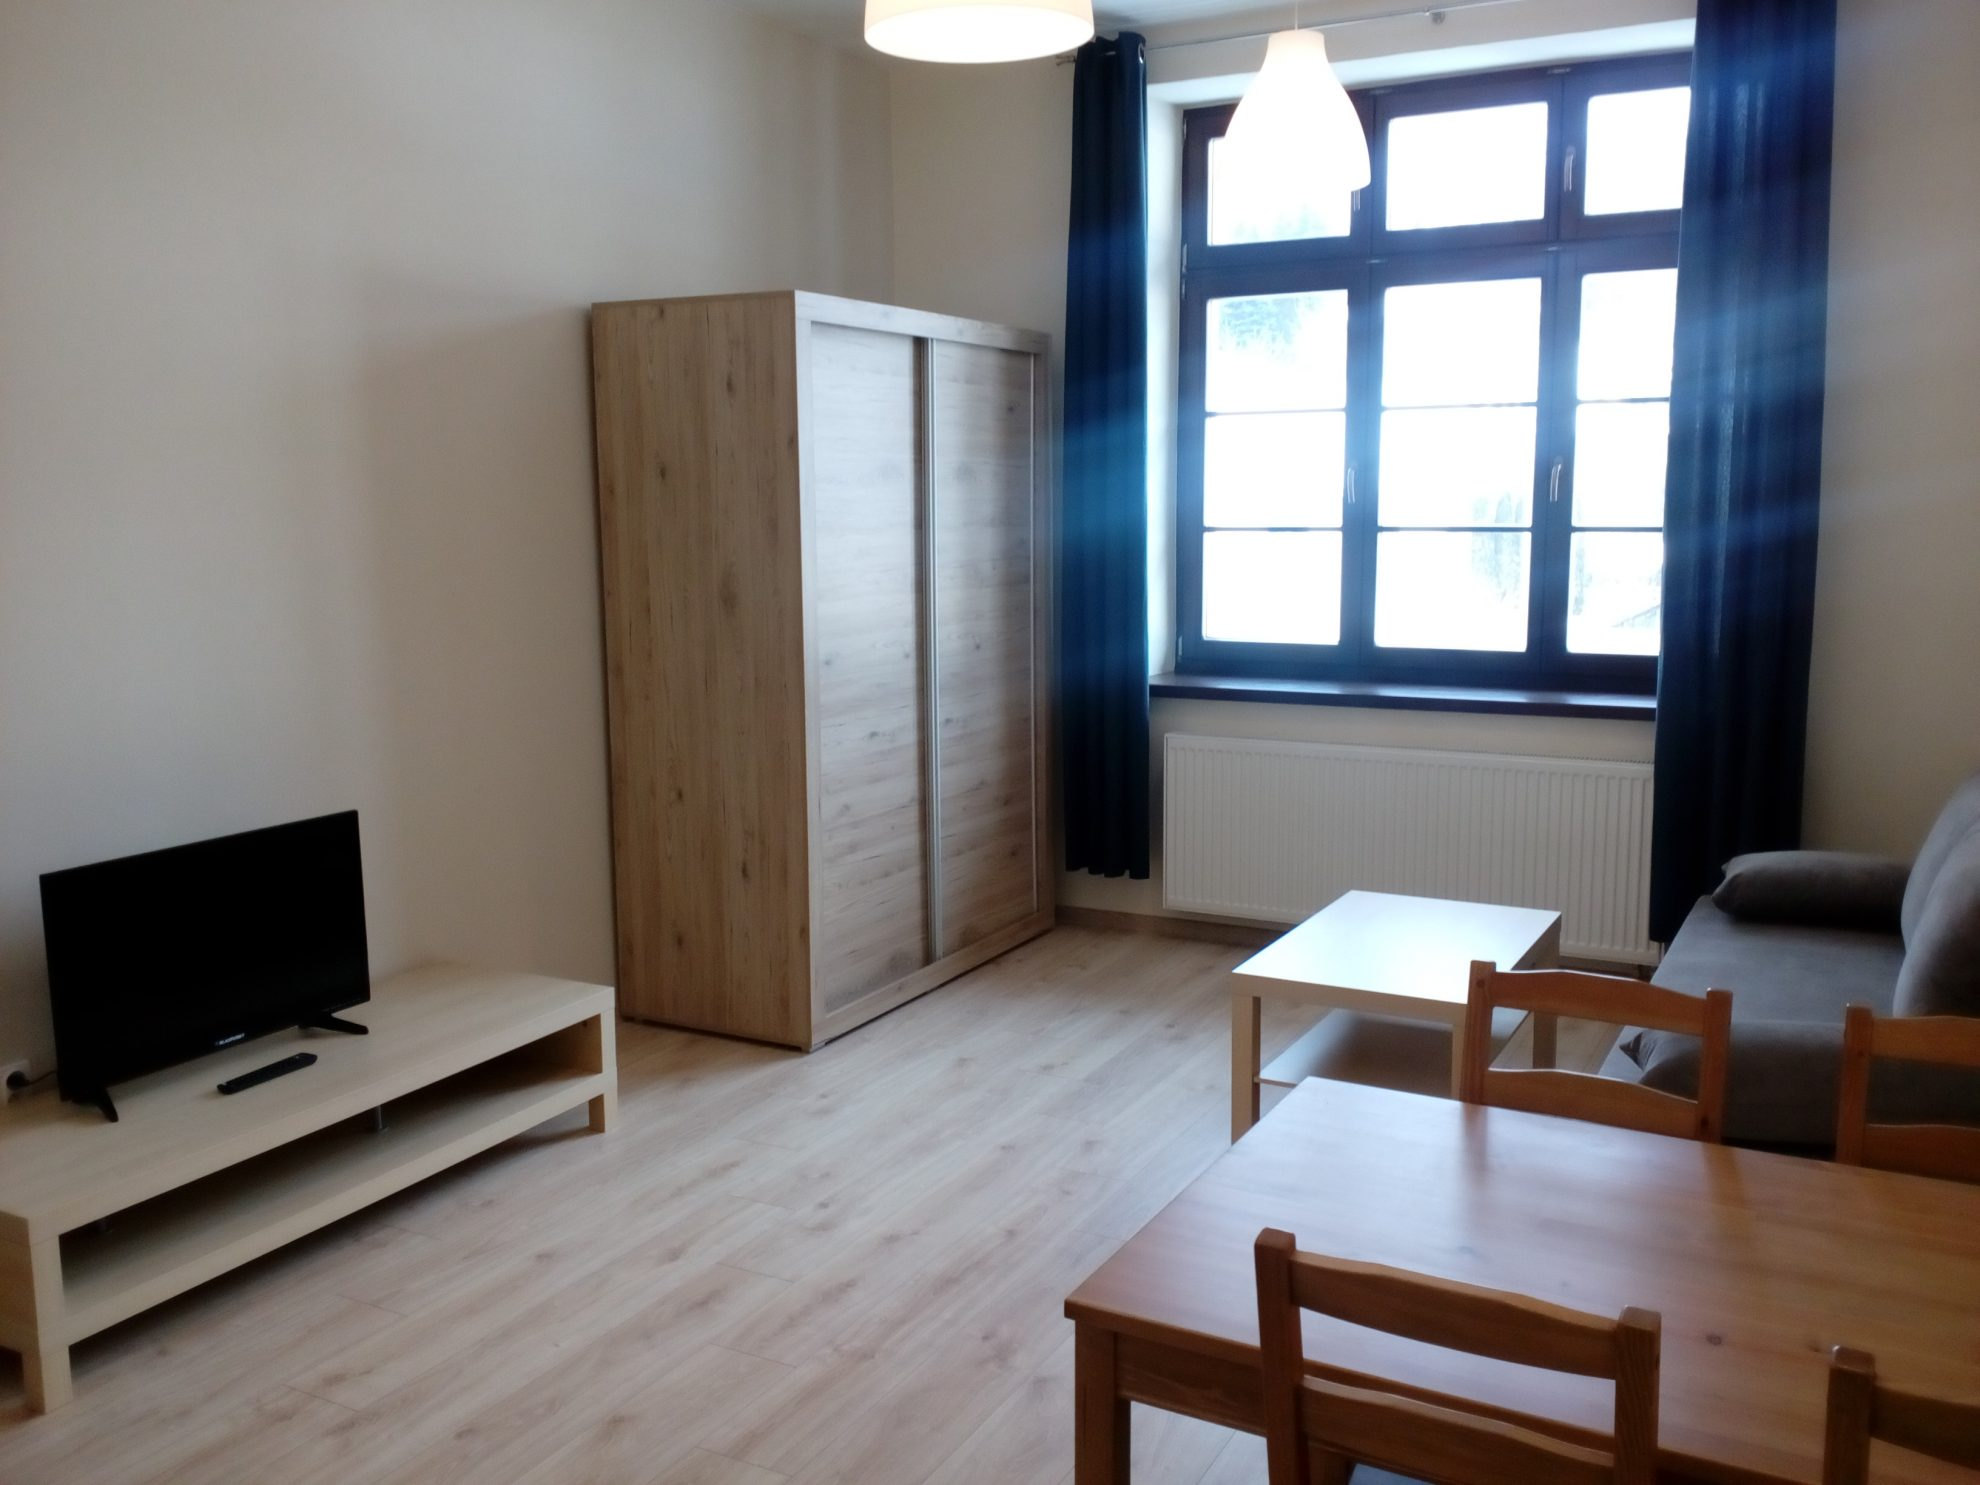 Apartament 2 pokojowy 6 os.